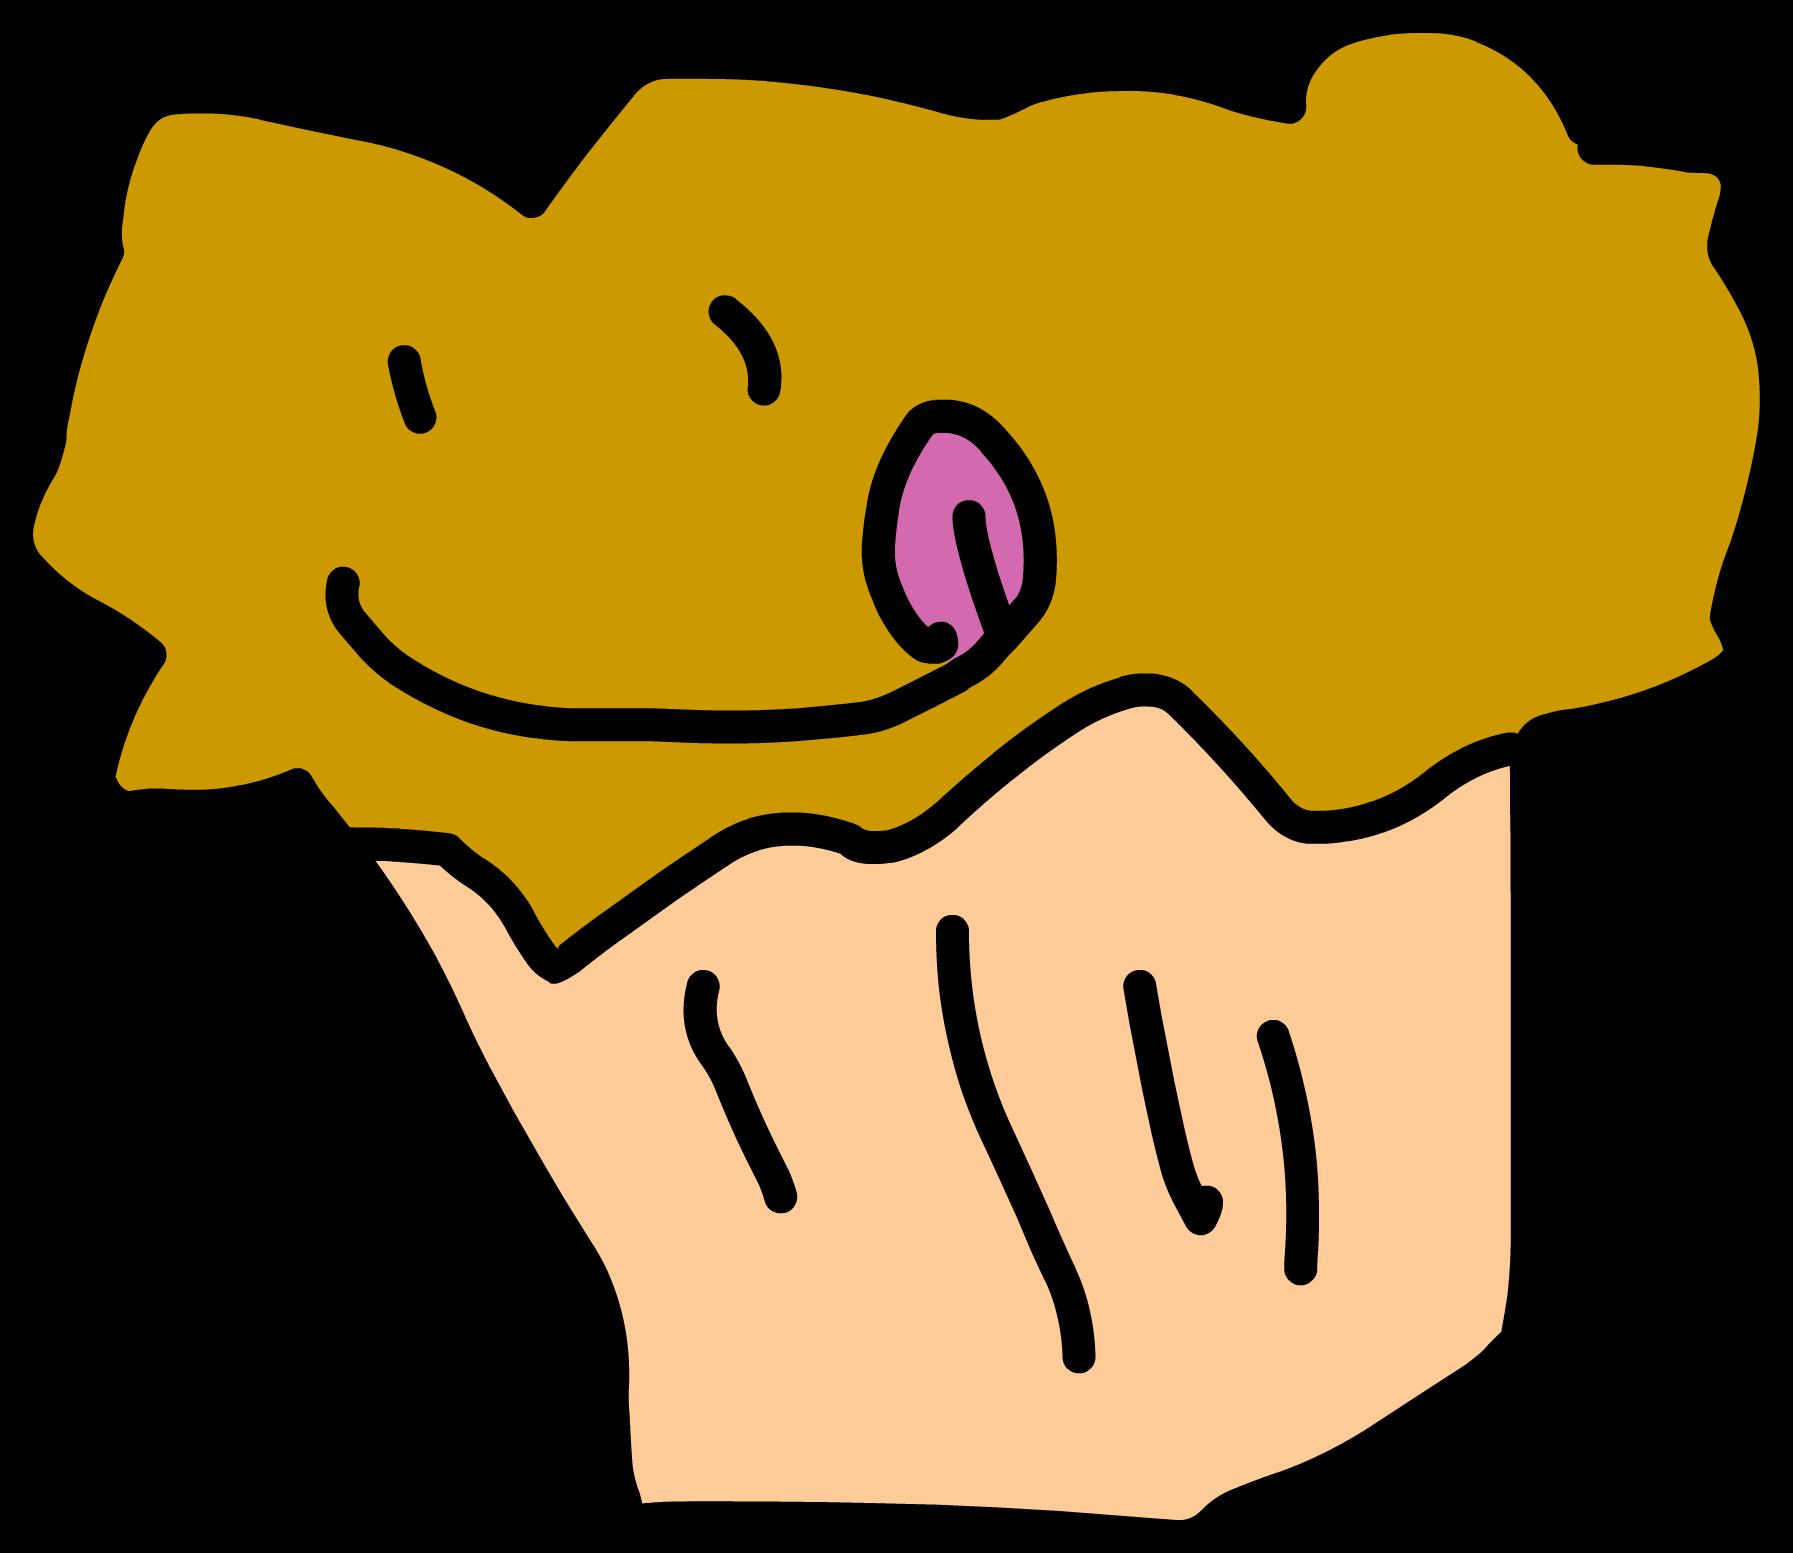 Muffin BFDI21 23